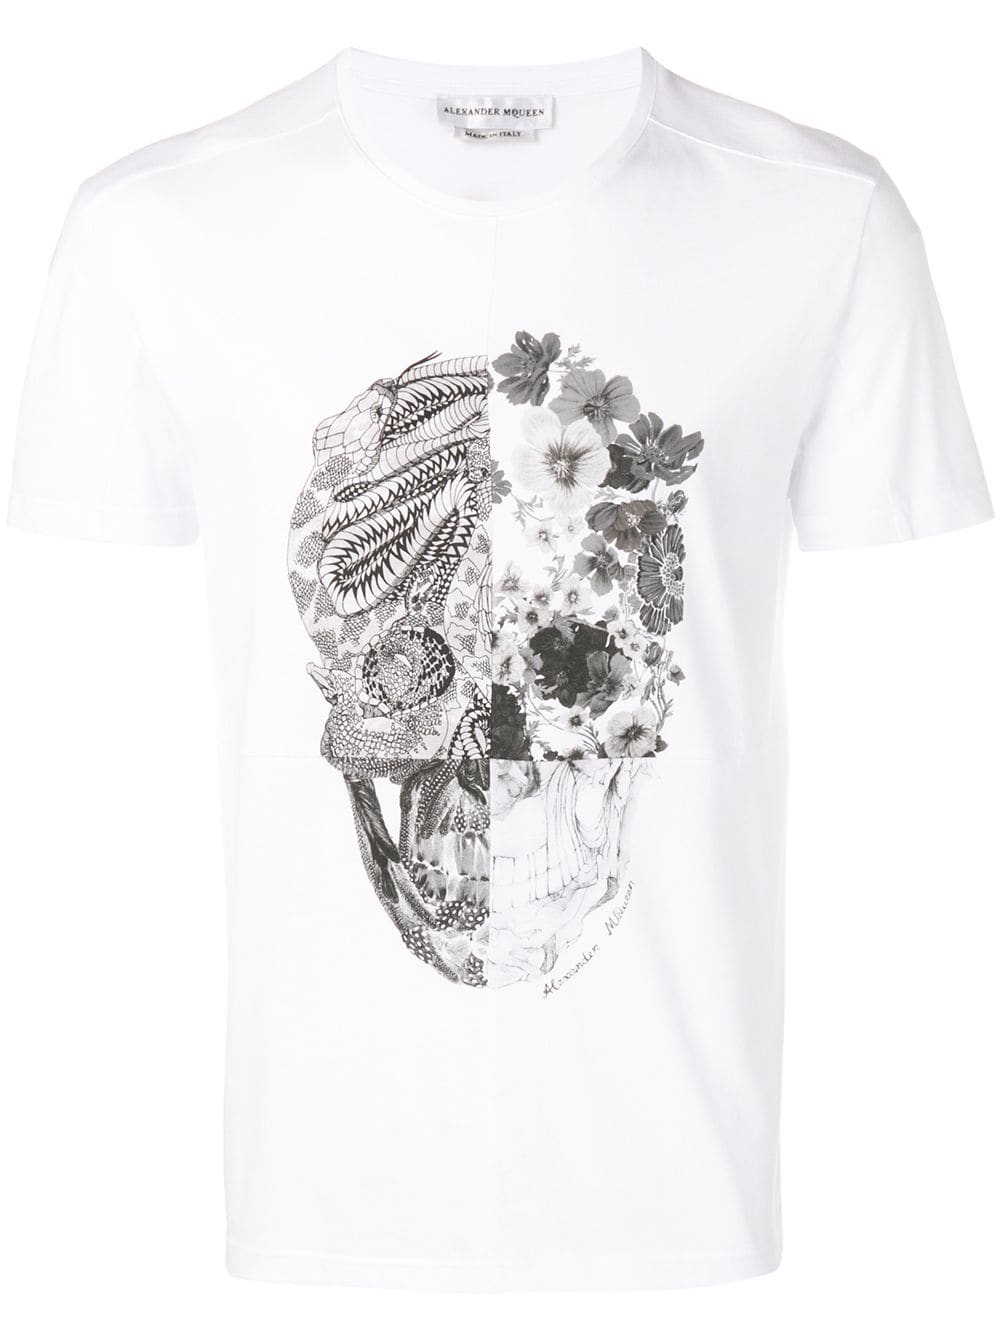 ca79aa92e White T-Shirt with patchwork Skull - ALEXANDER MCQUEEN - Russocapri